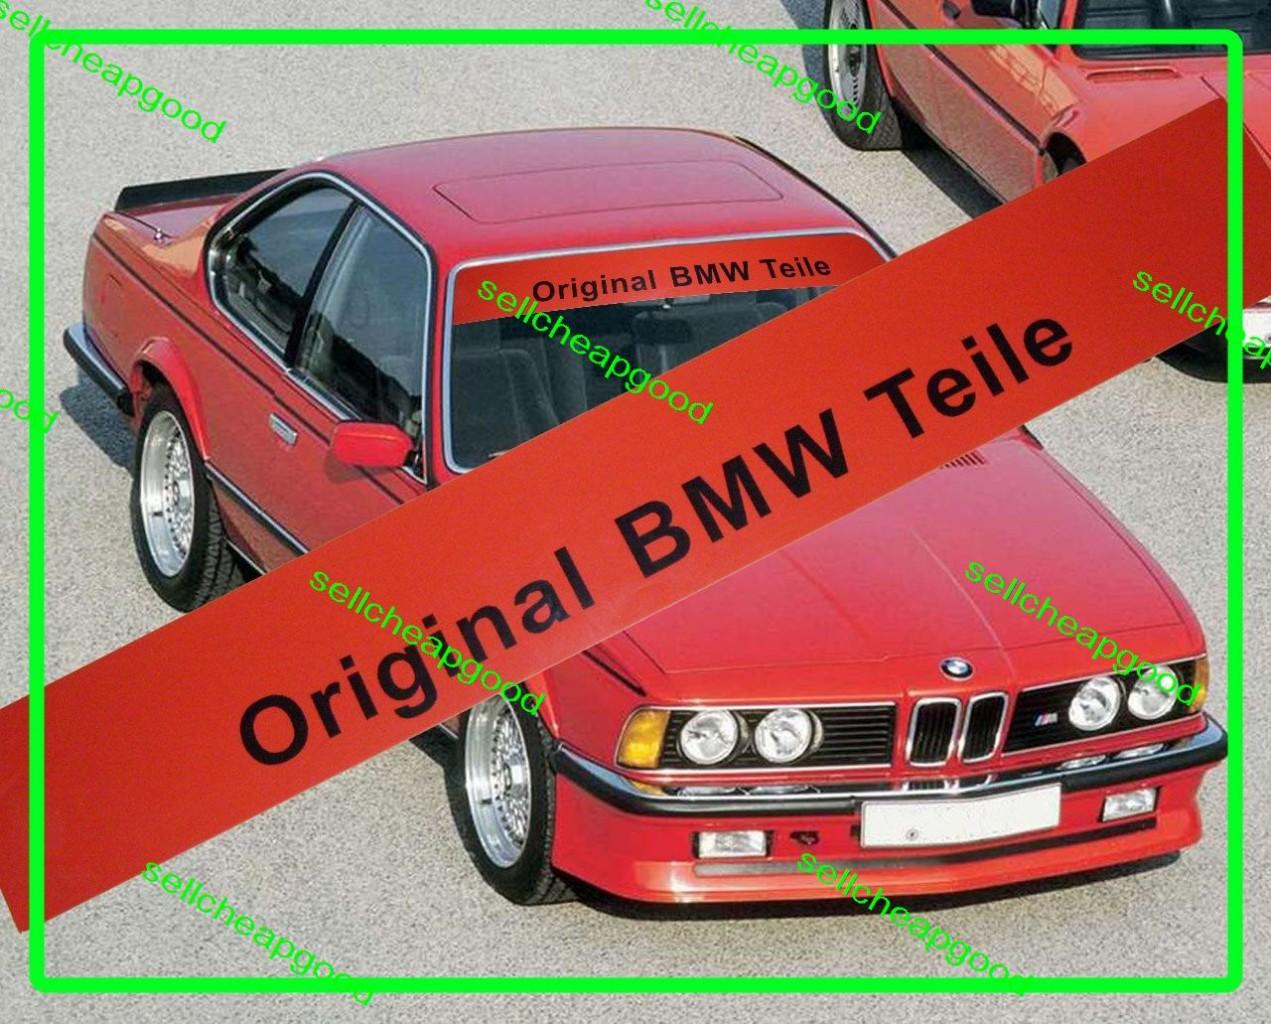 original bmw teile windshield decal m3 e30 dtm e24 m6 m. Black Bedroom Furniture Sets. Home Design Ideas